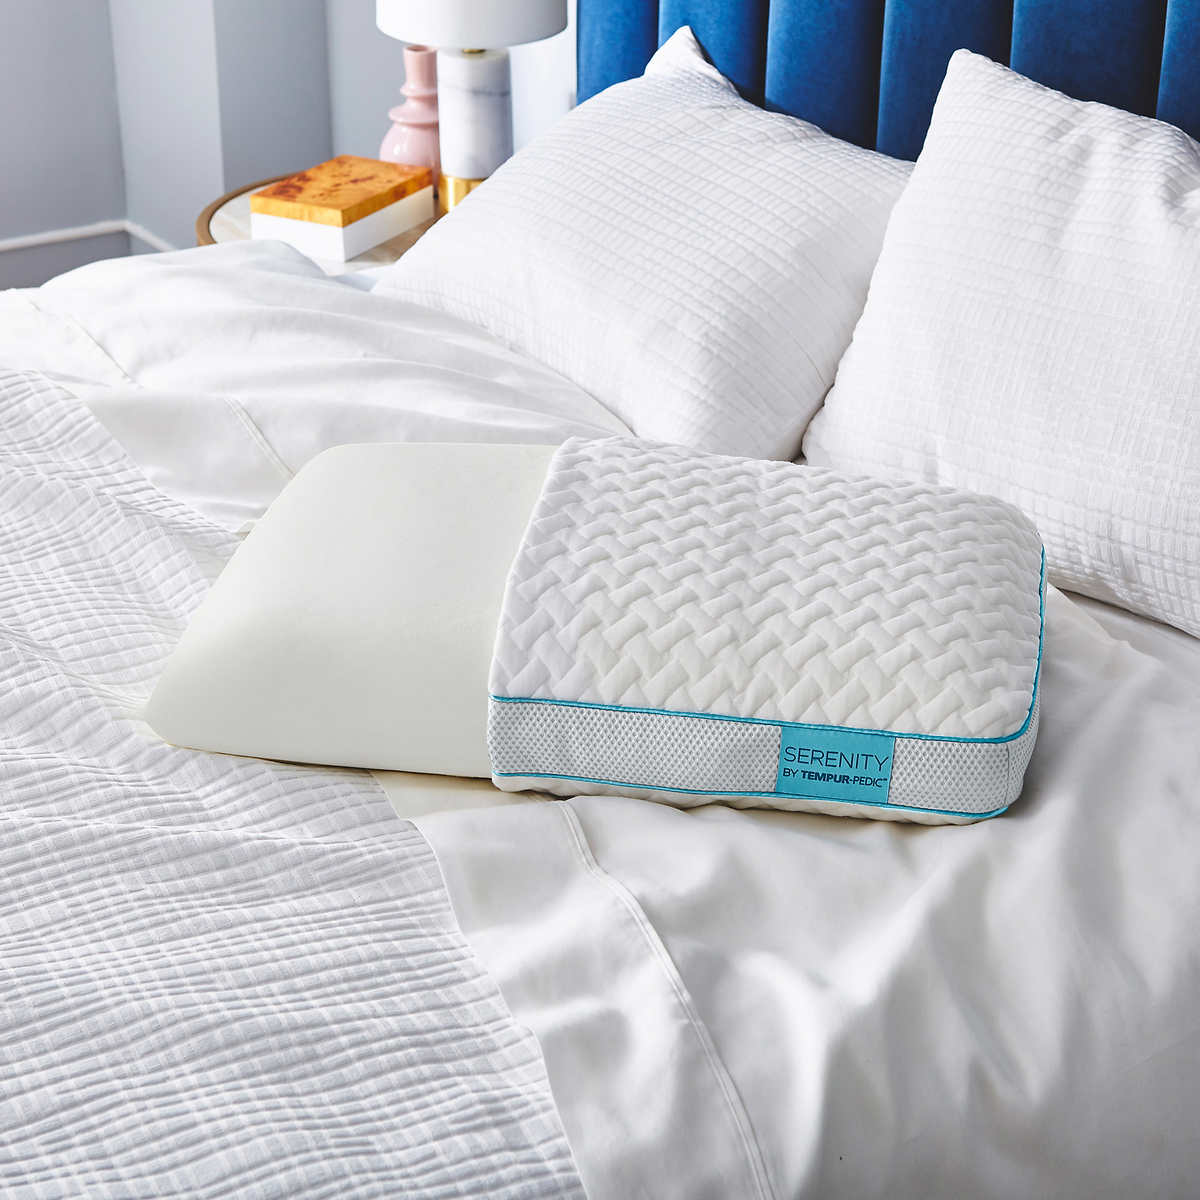 best service b4432 4fec7 Serenity by Tempur-Pedic Memory Foam Bed Pillow